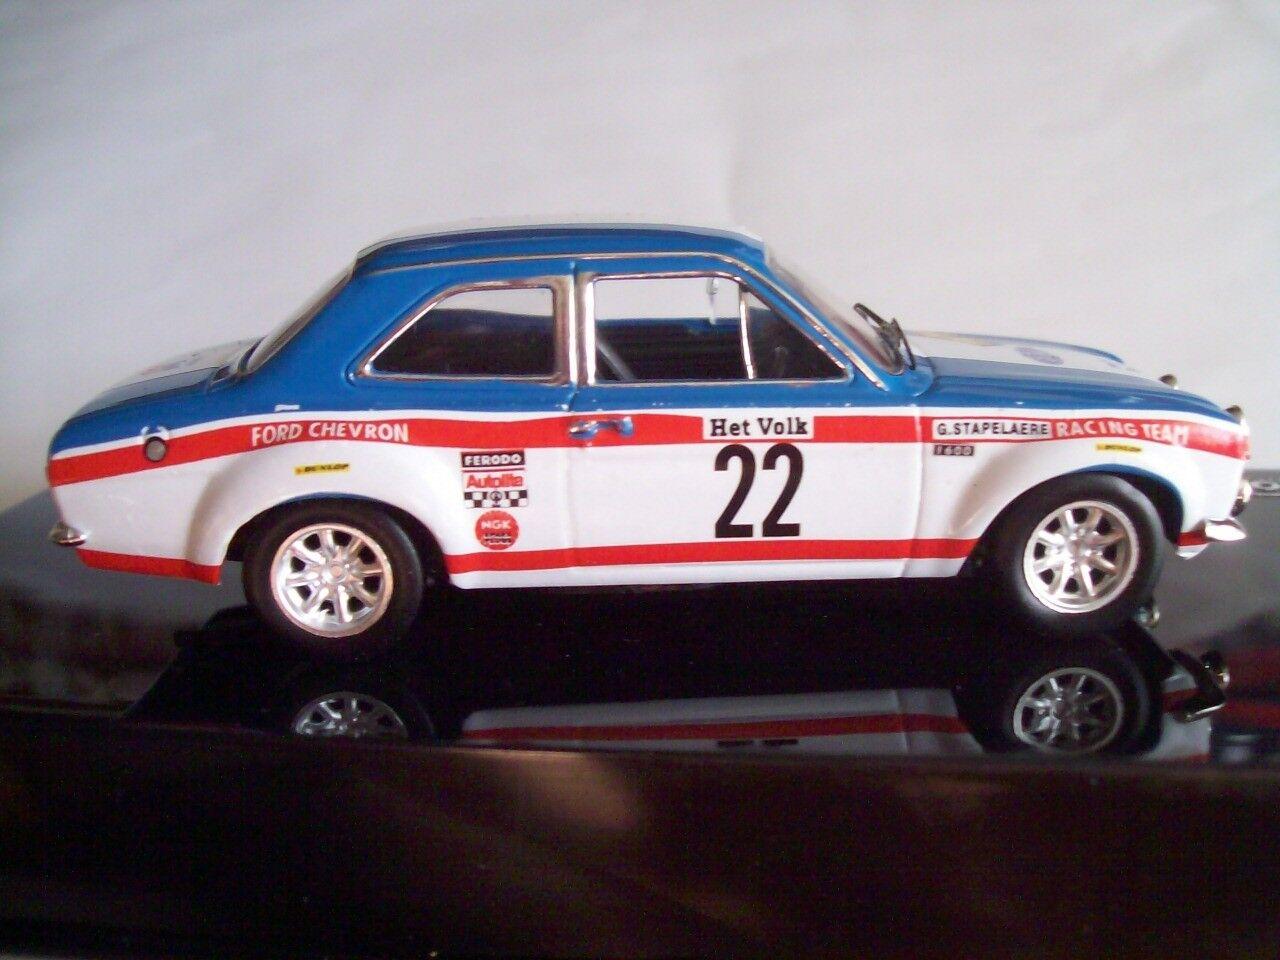 1970 FORD ESCORT 1600 Mk1 WINNER YPRES RALLY - STAEPELAERE AERTS - IXO 1 43 NEW